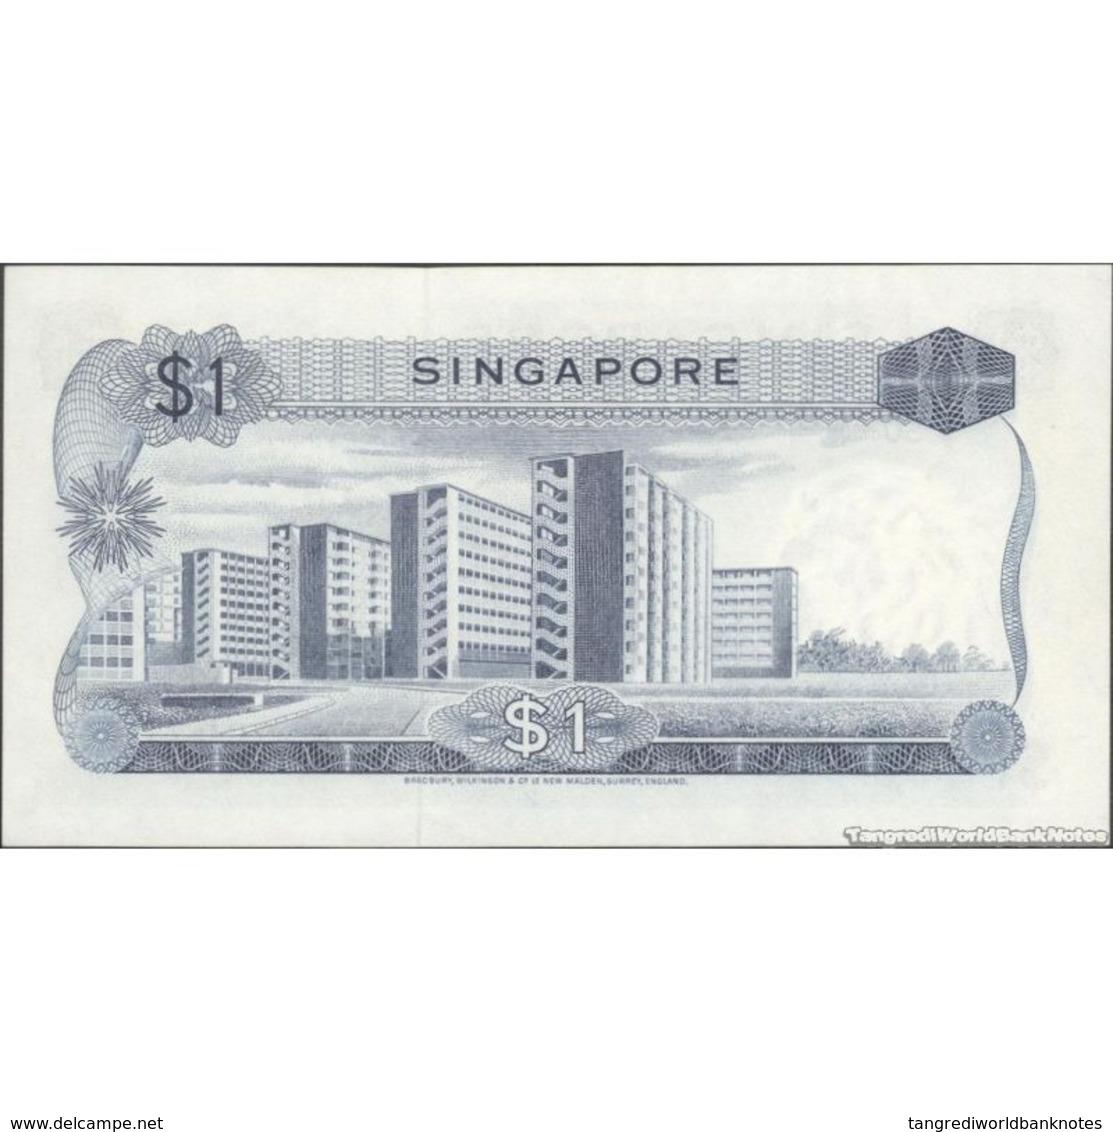 TWN - SINGAPORE 1a - 1 Dollar 1976 A/50 260711 UNC - Singapore